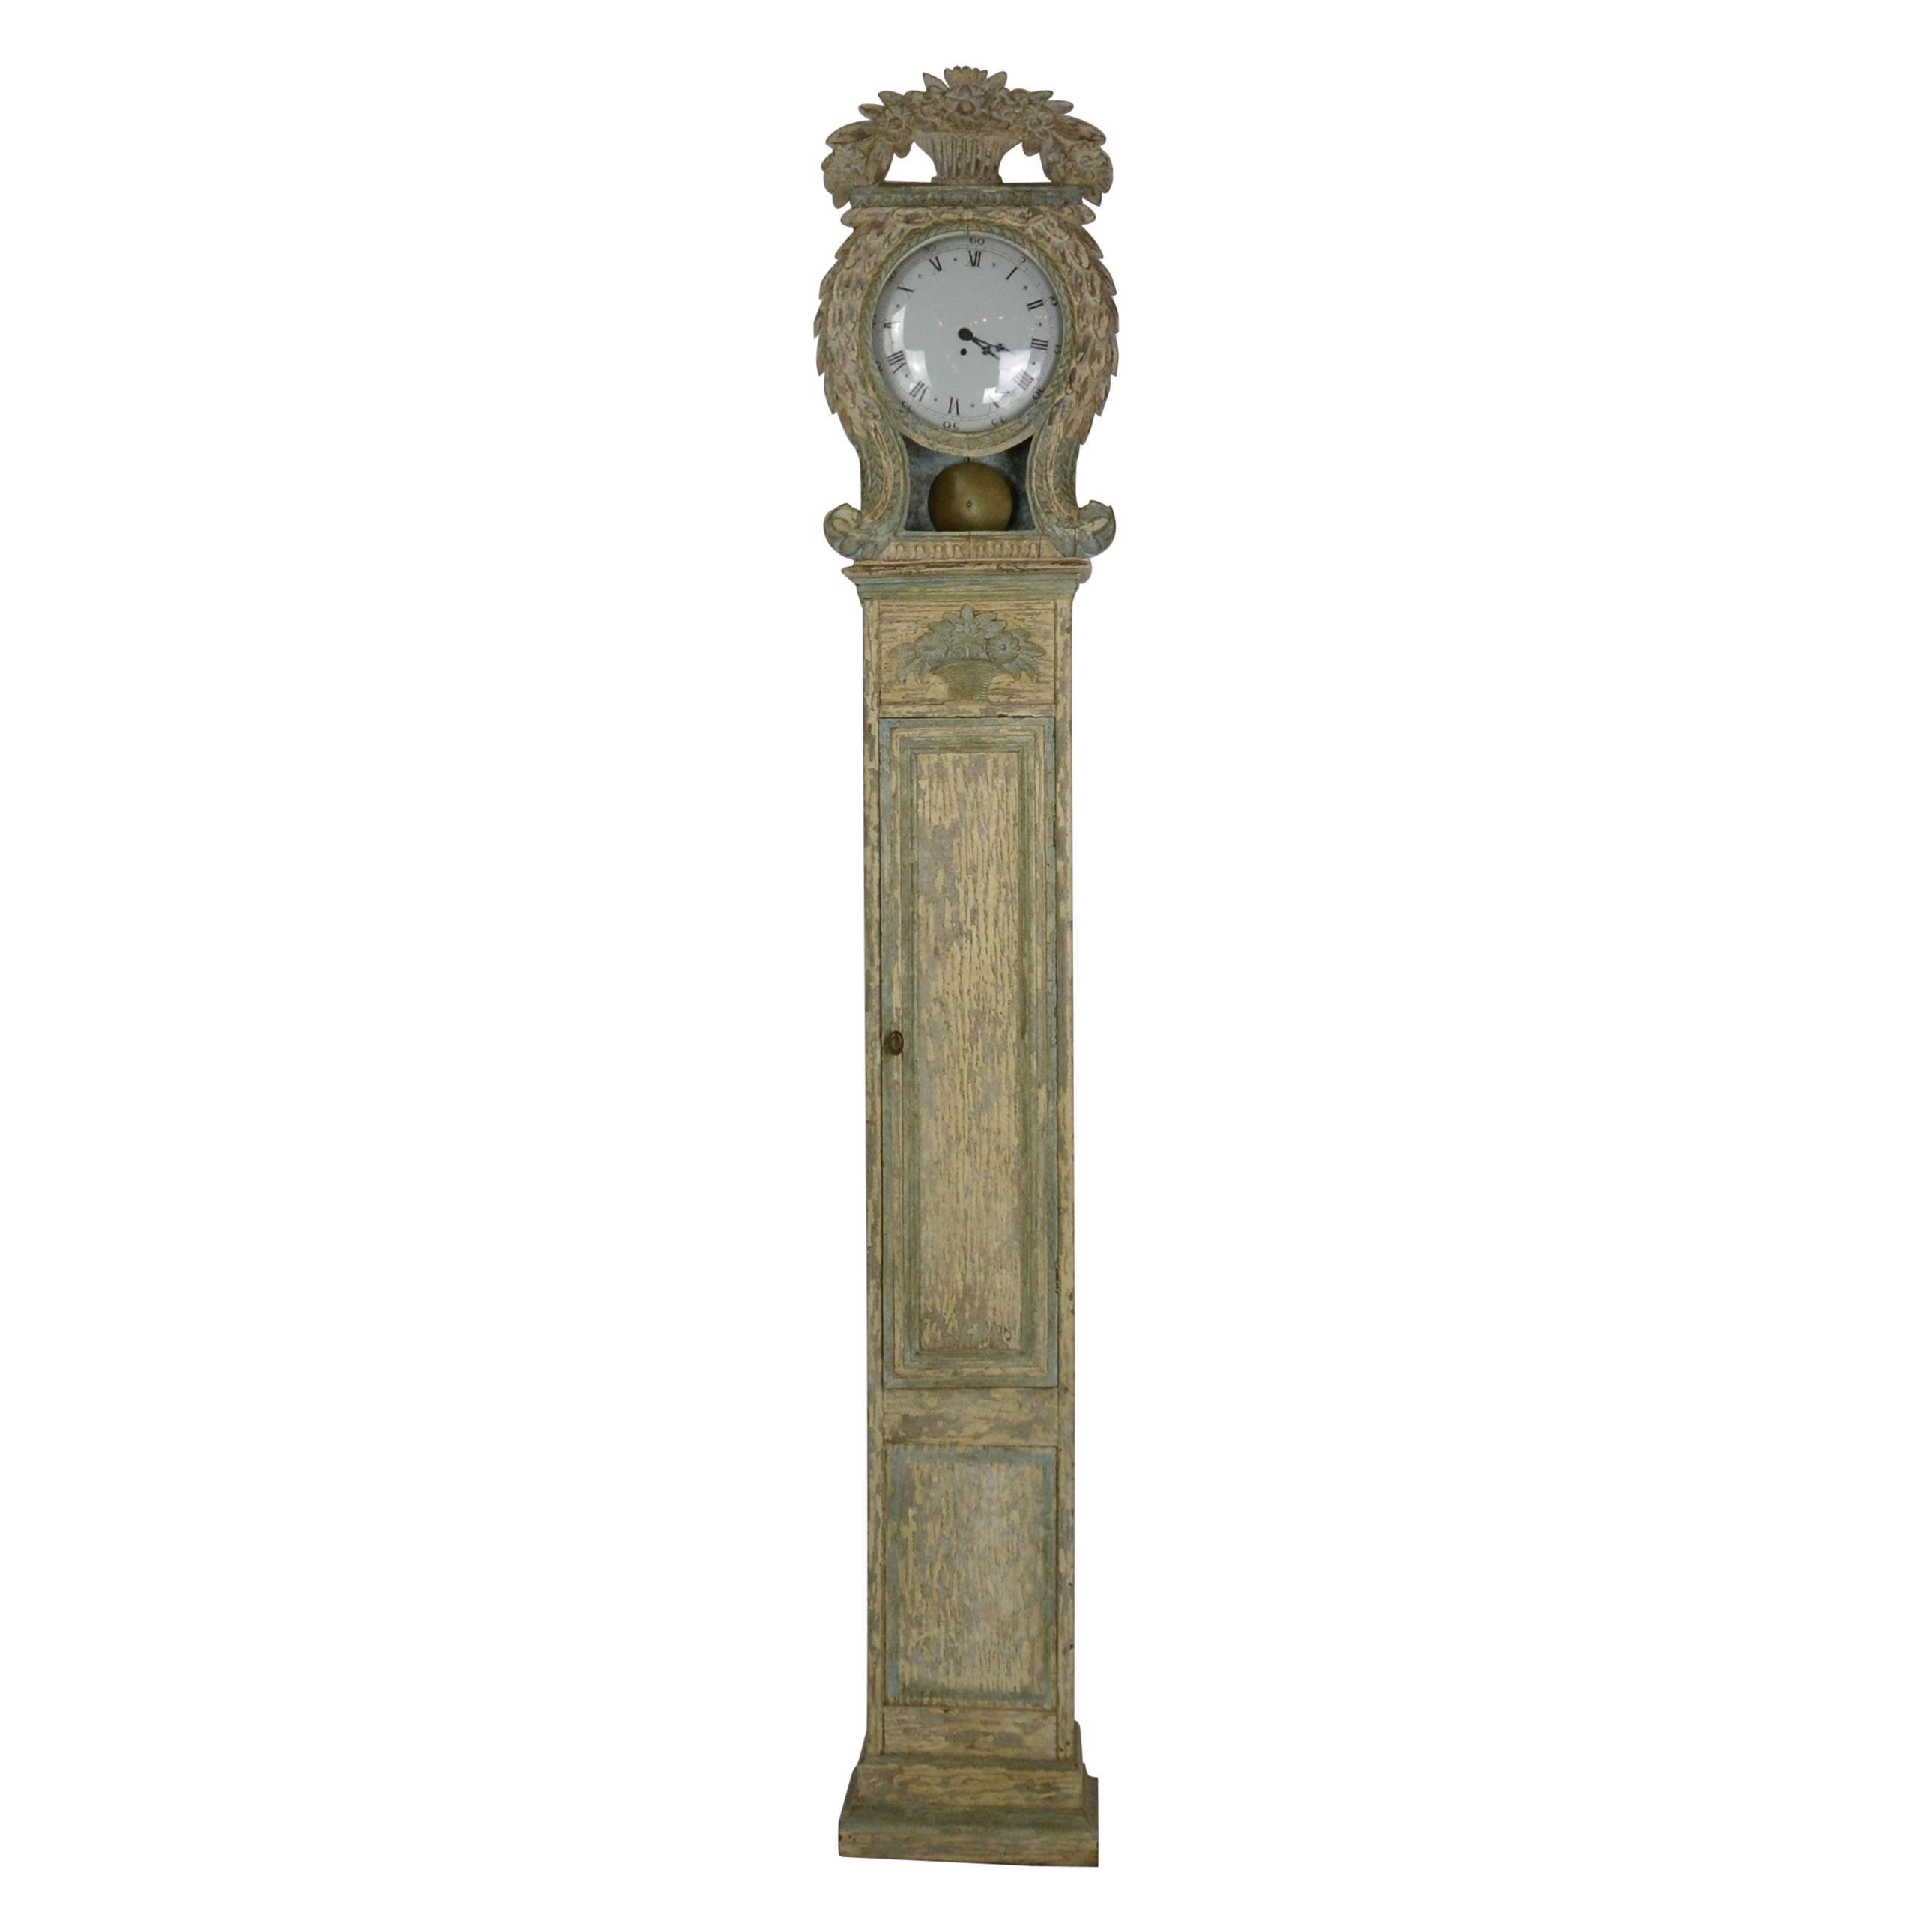 Gustavian Style Grandfather Clock